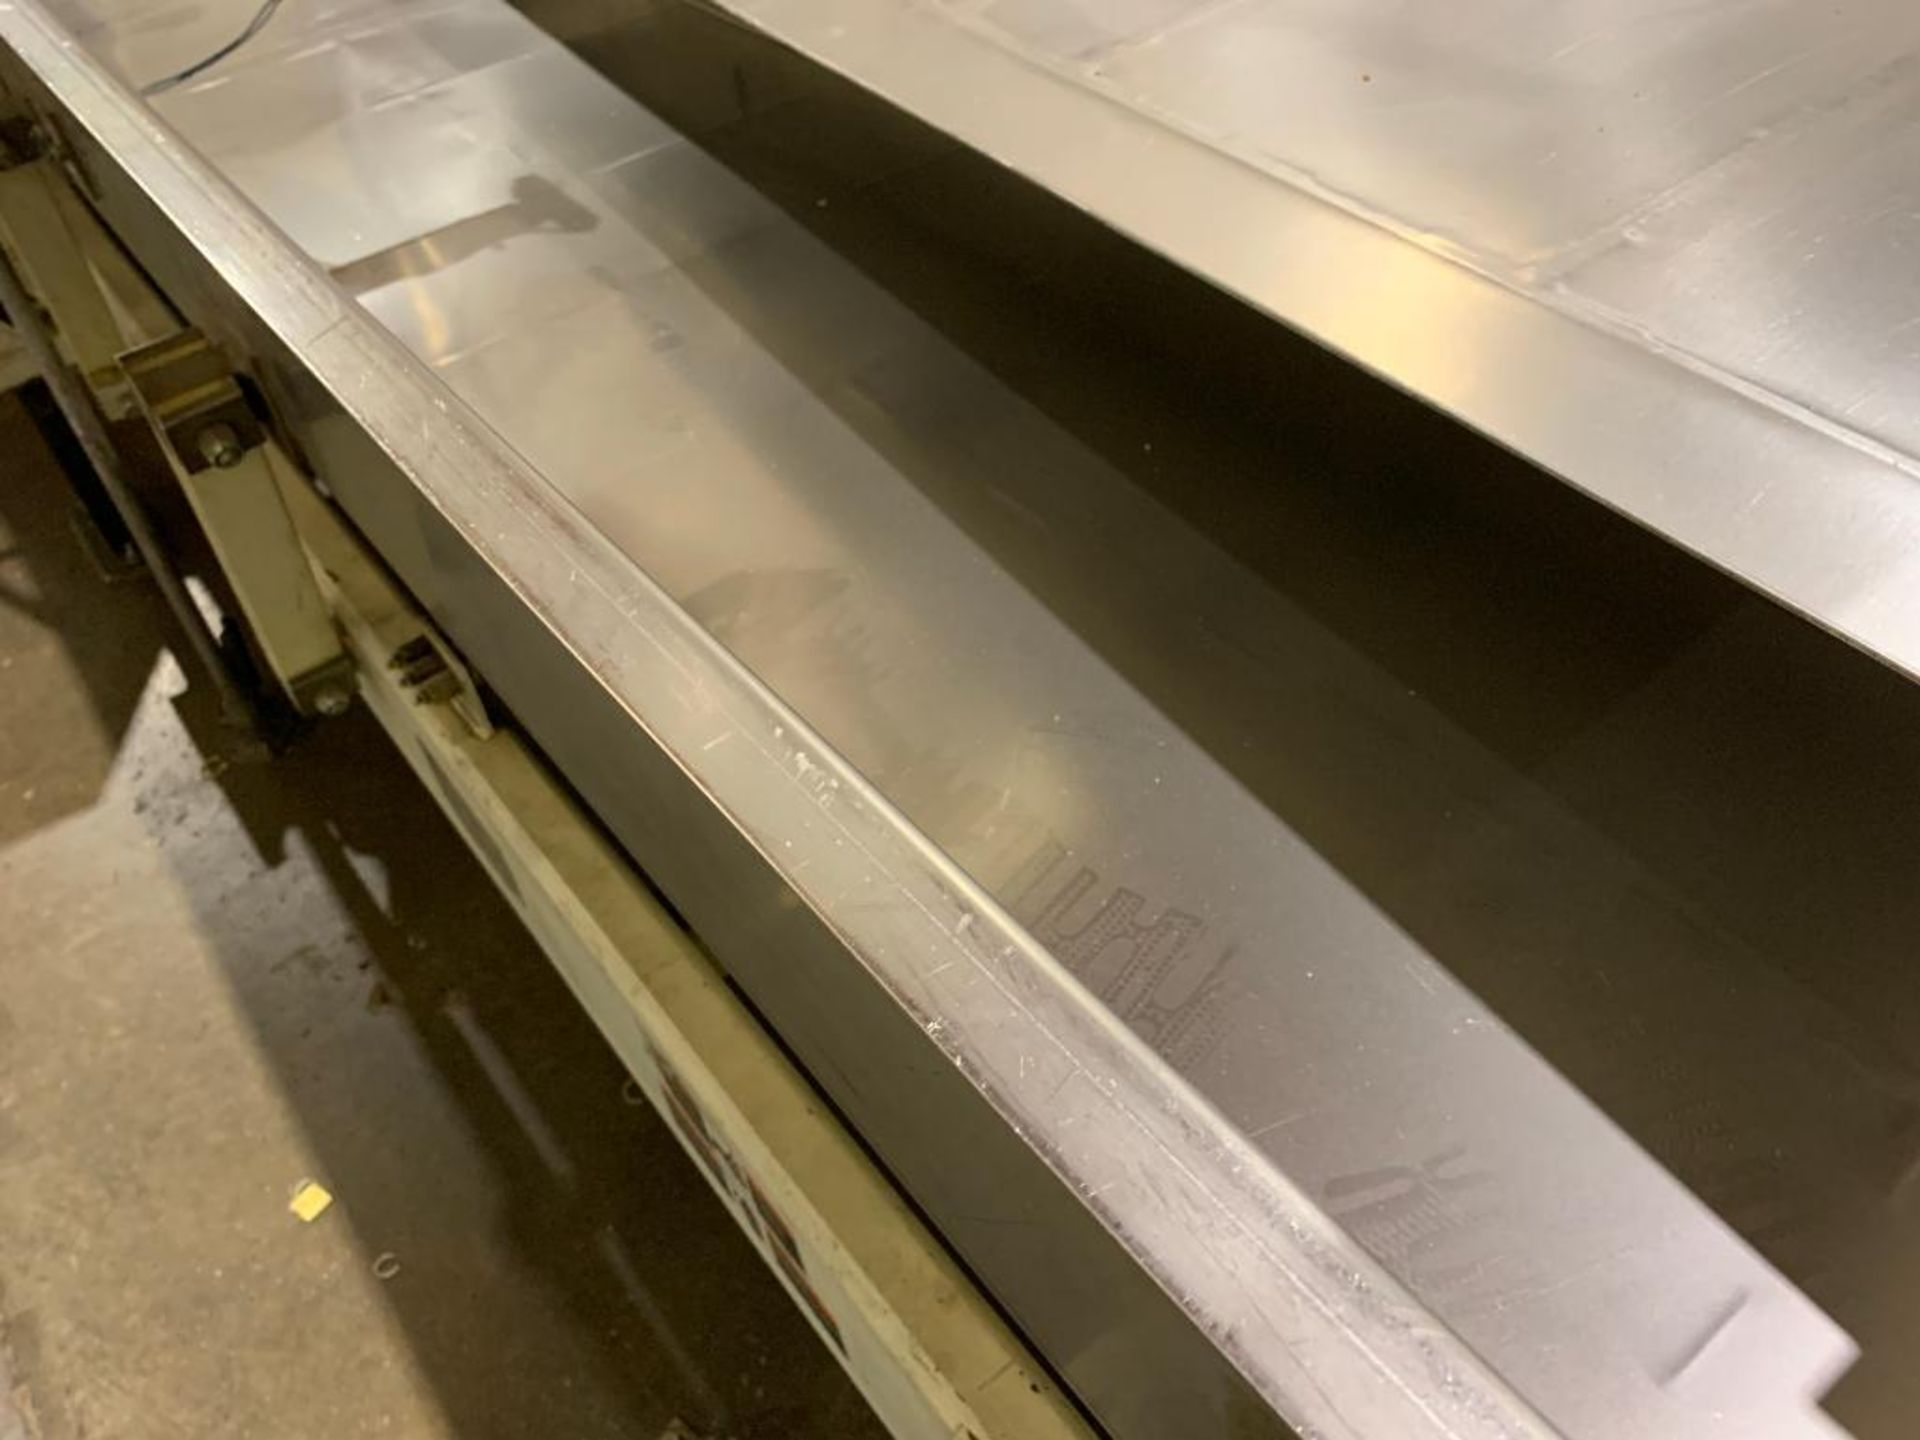 1992 Link-Belt vibratory conveyor, model LBL2405-10X12-10 - Image 3 of 34